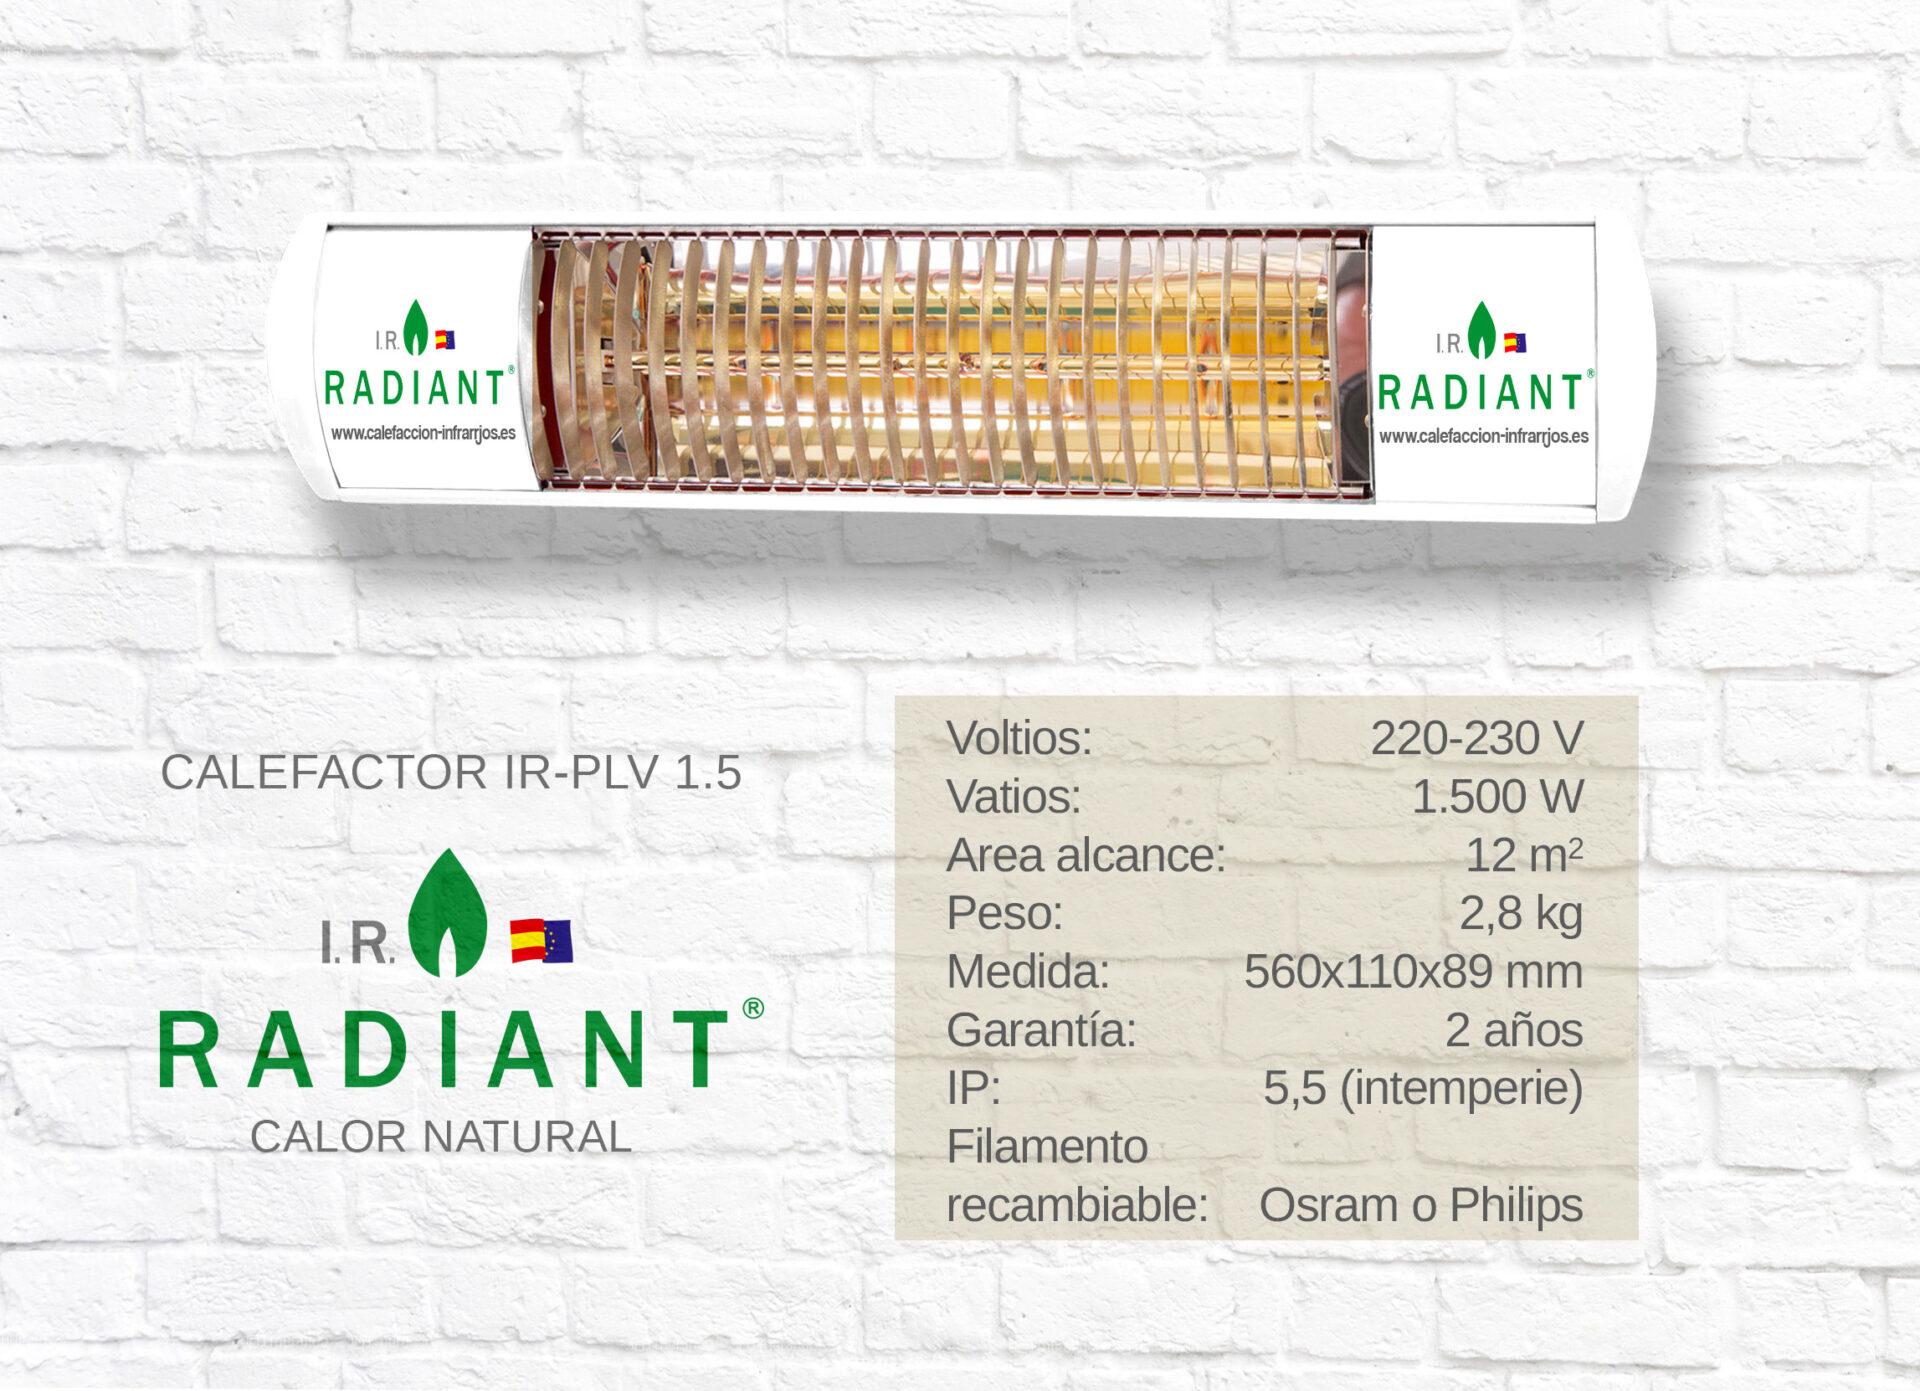 calefactor-exterior-IR-RADIANT